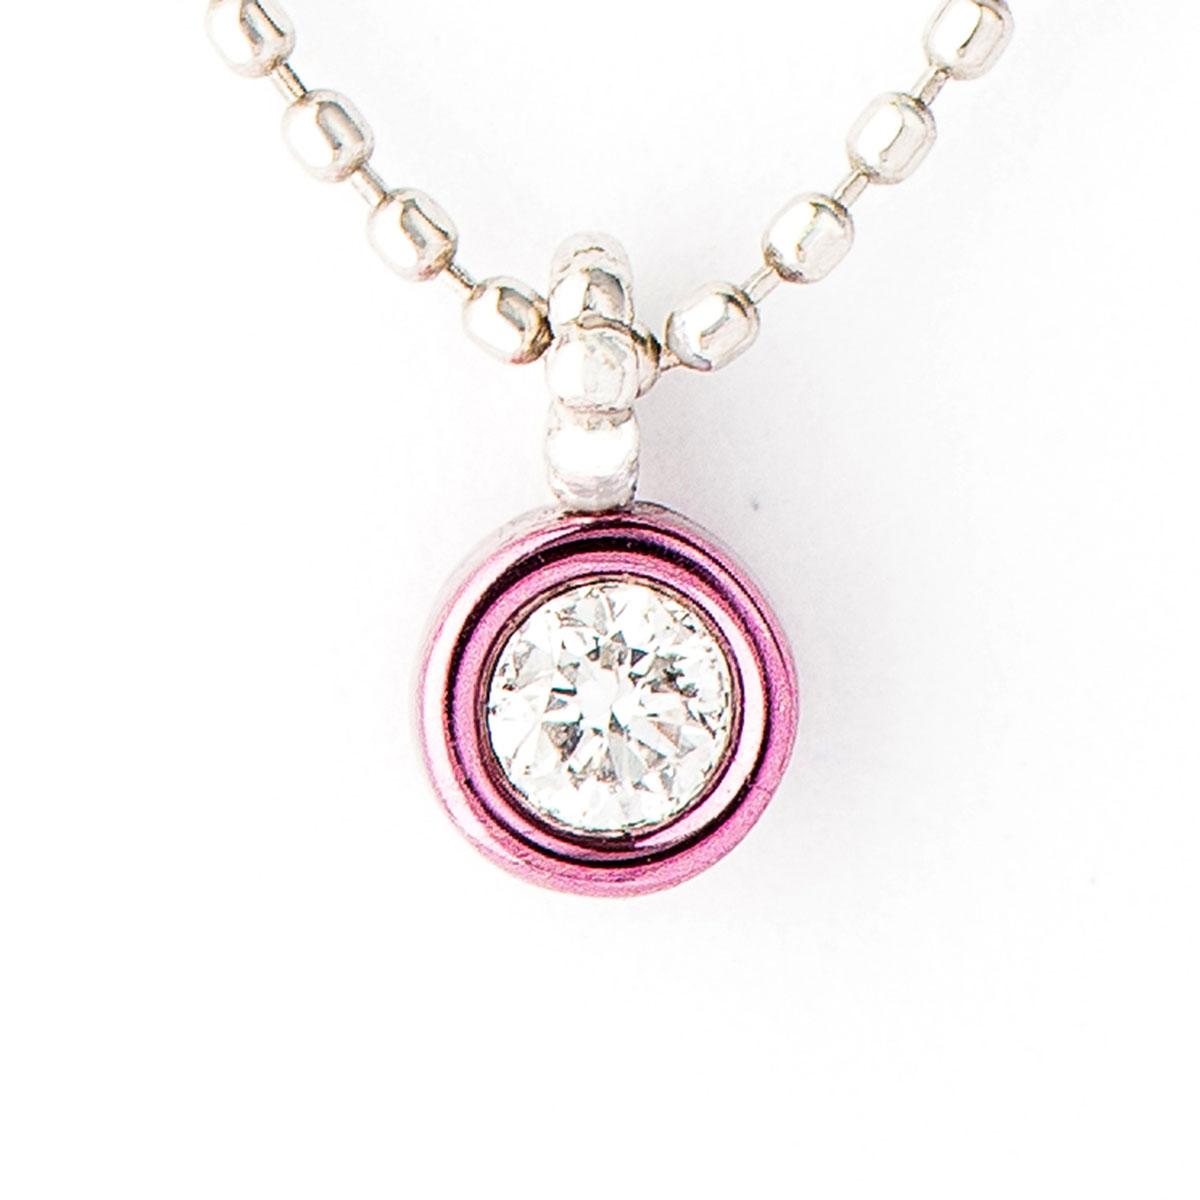 Cierin Cute ダイヤモンド ペンダント ネックレス